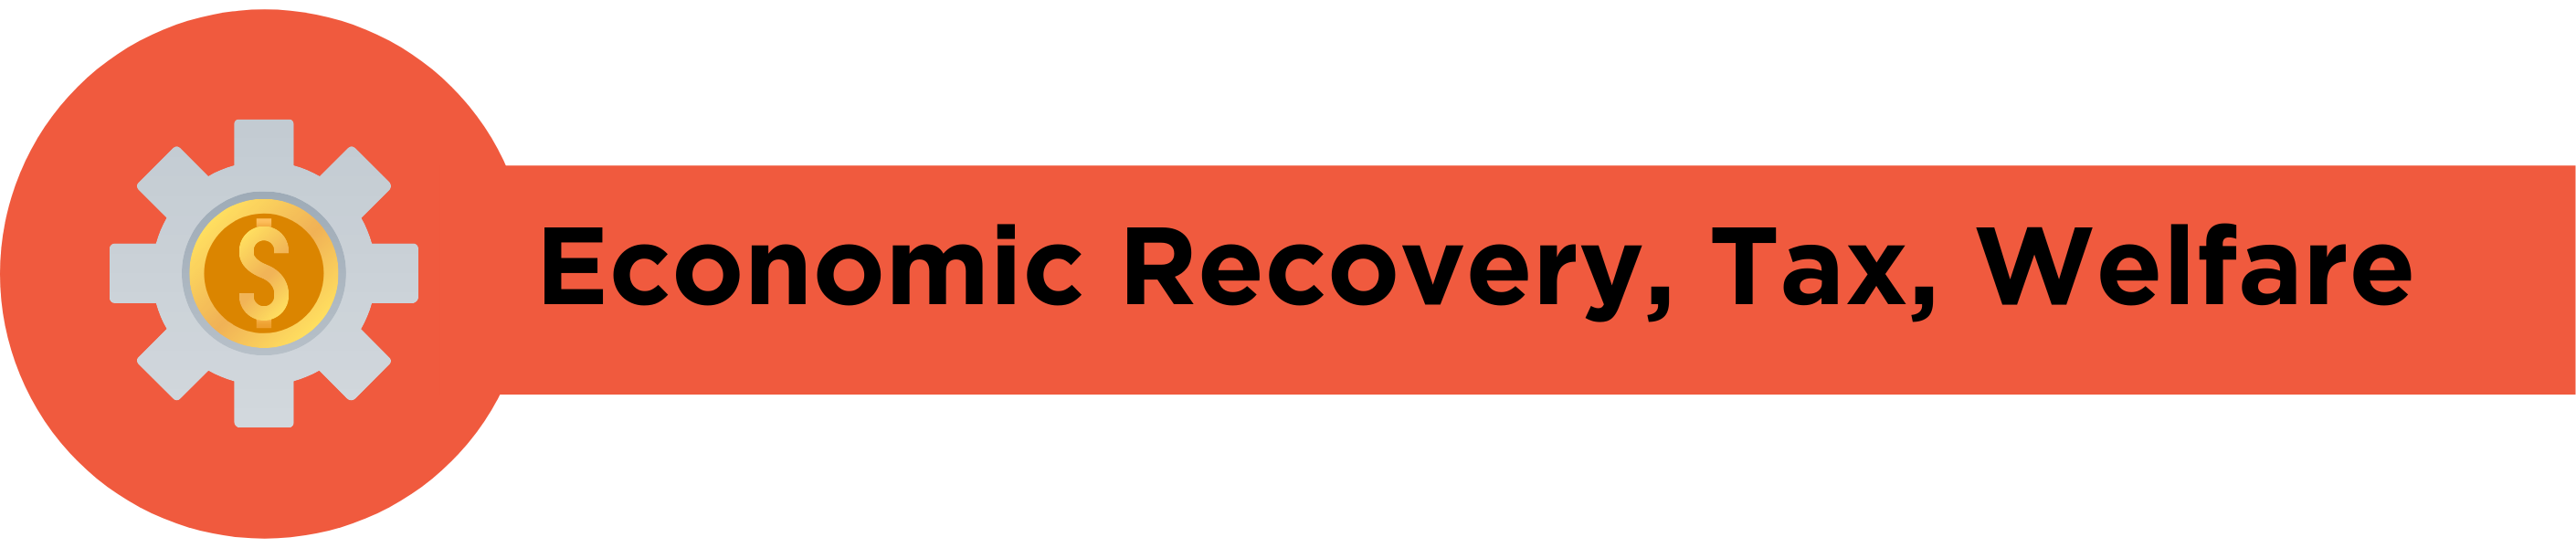 Economic Recovery, Tax, Welfare